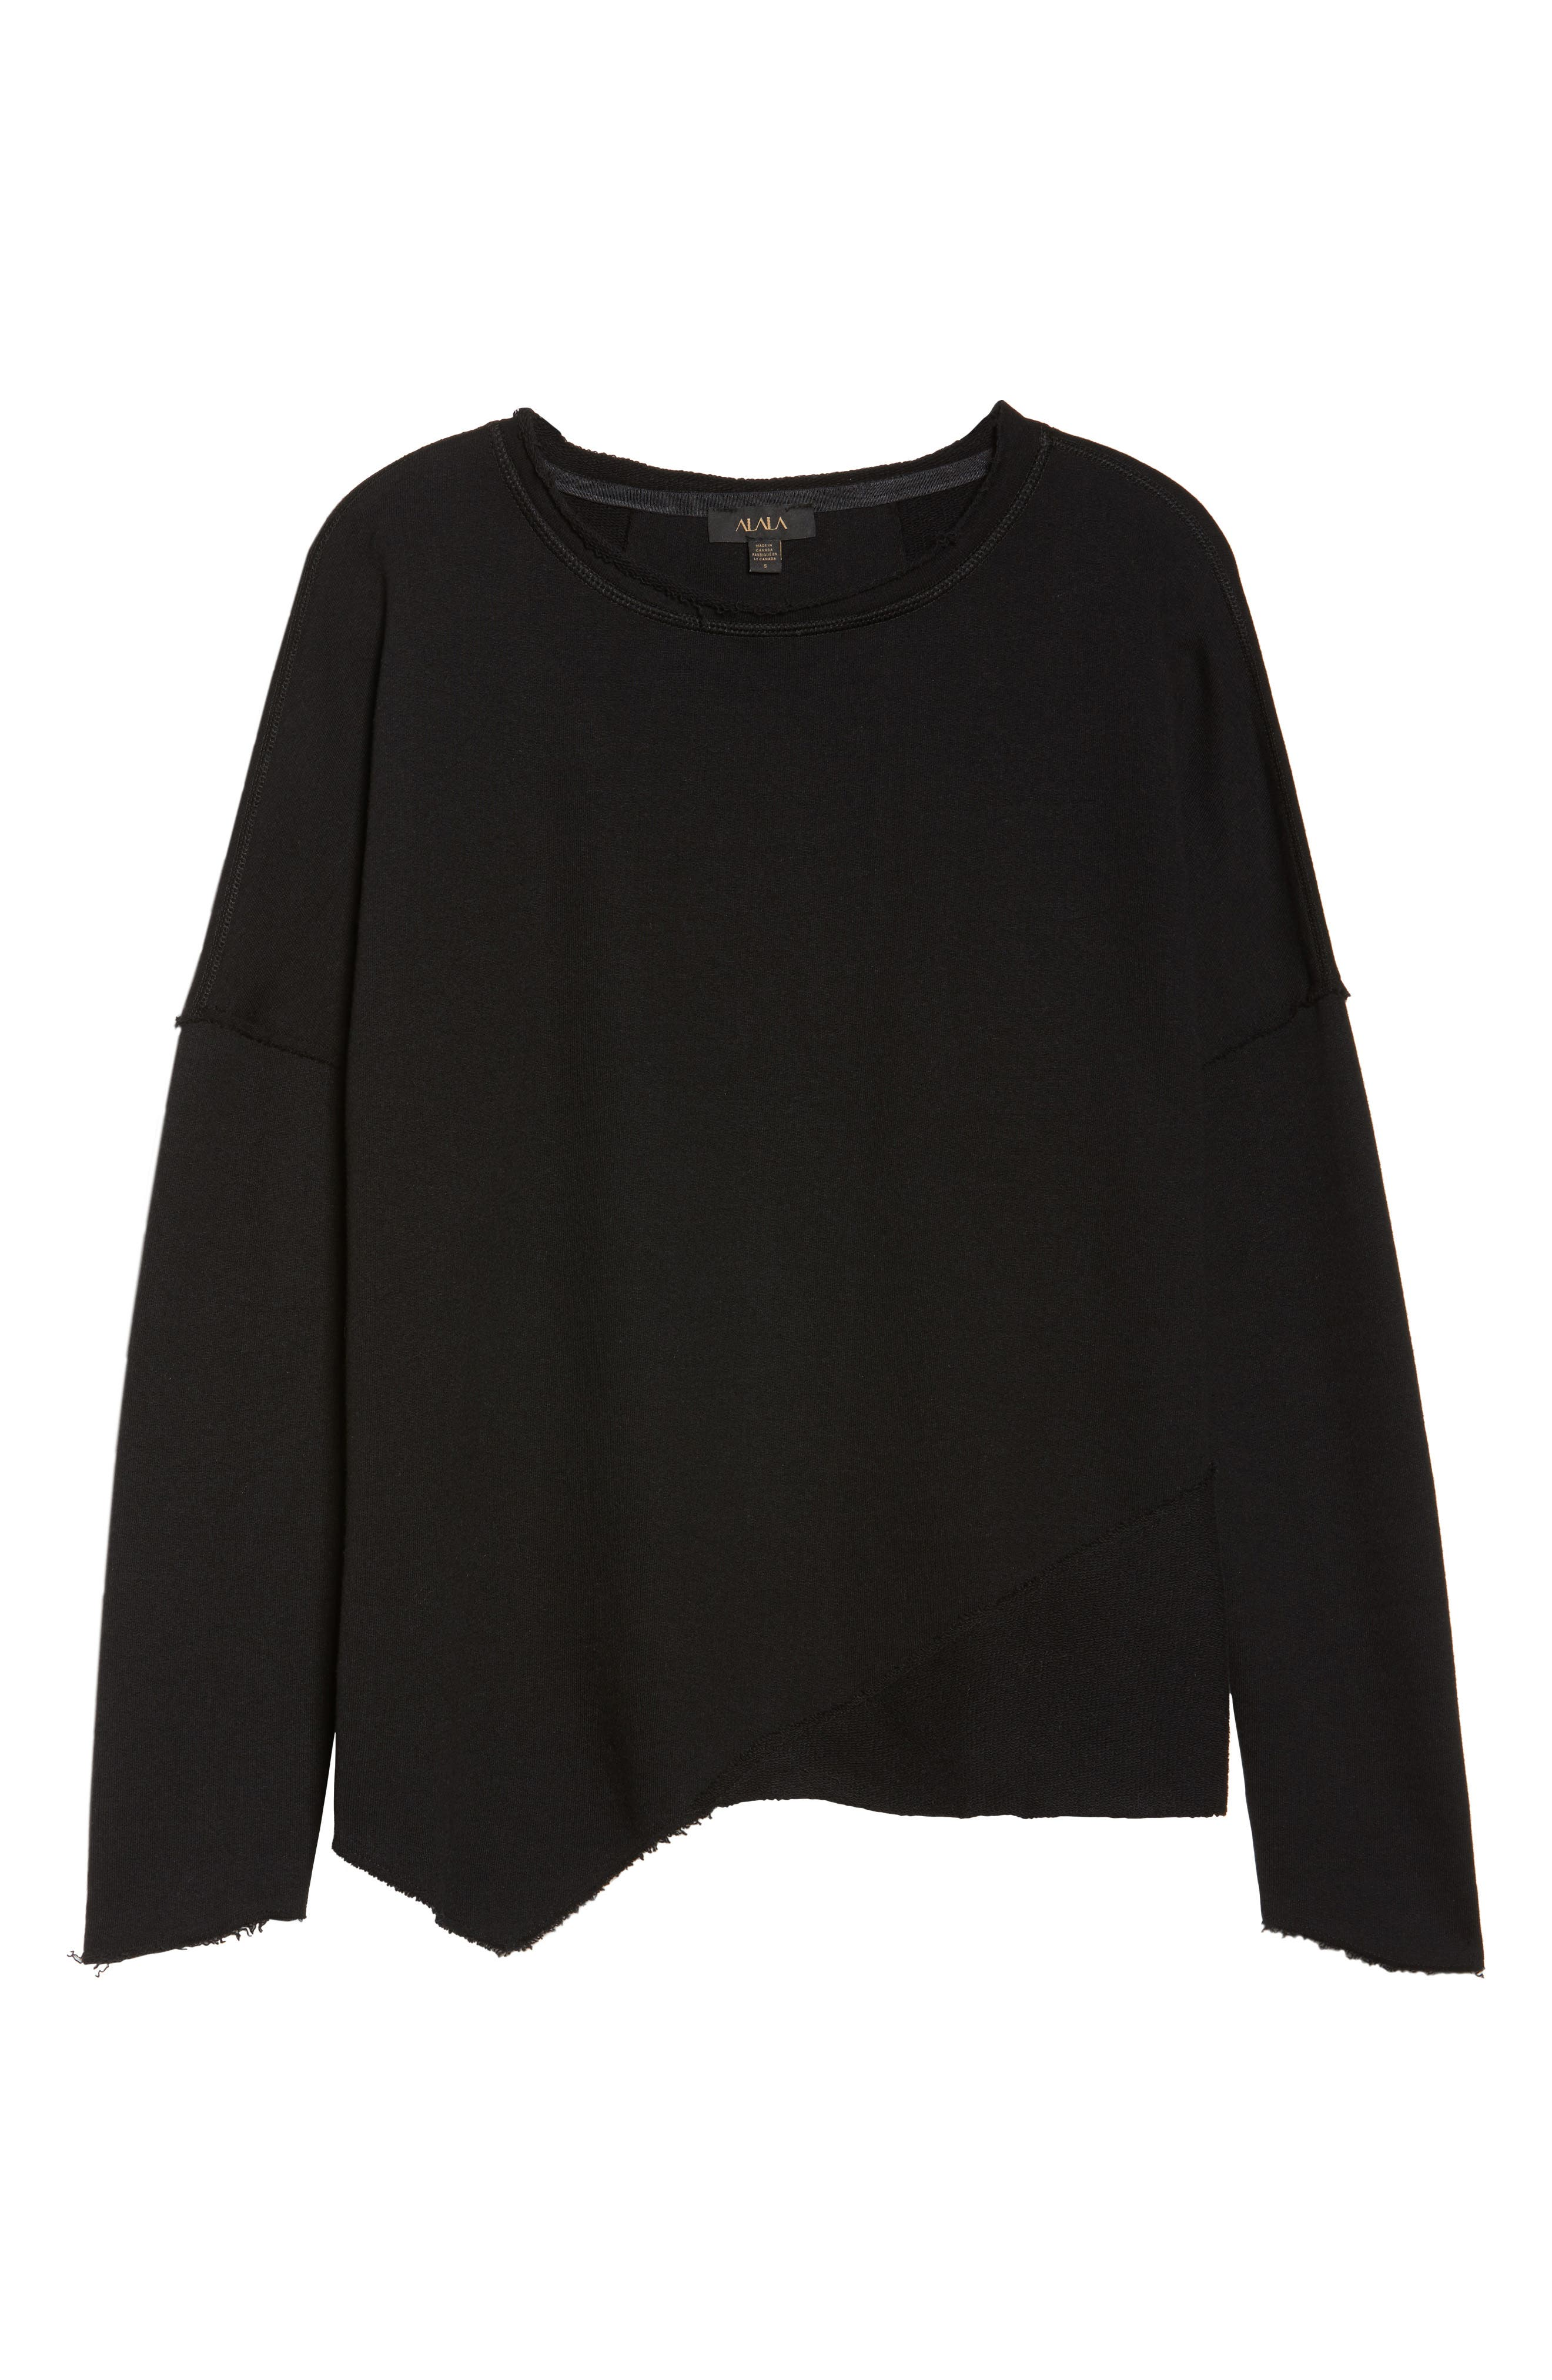 Exhale Sweatshirt,                             Alternate thumbnail 7, color,                             Black